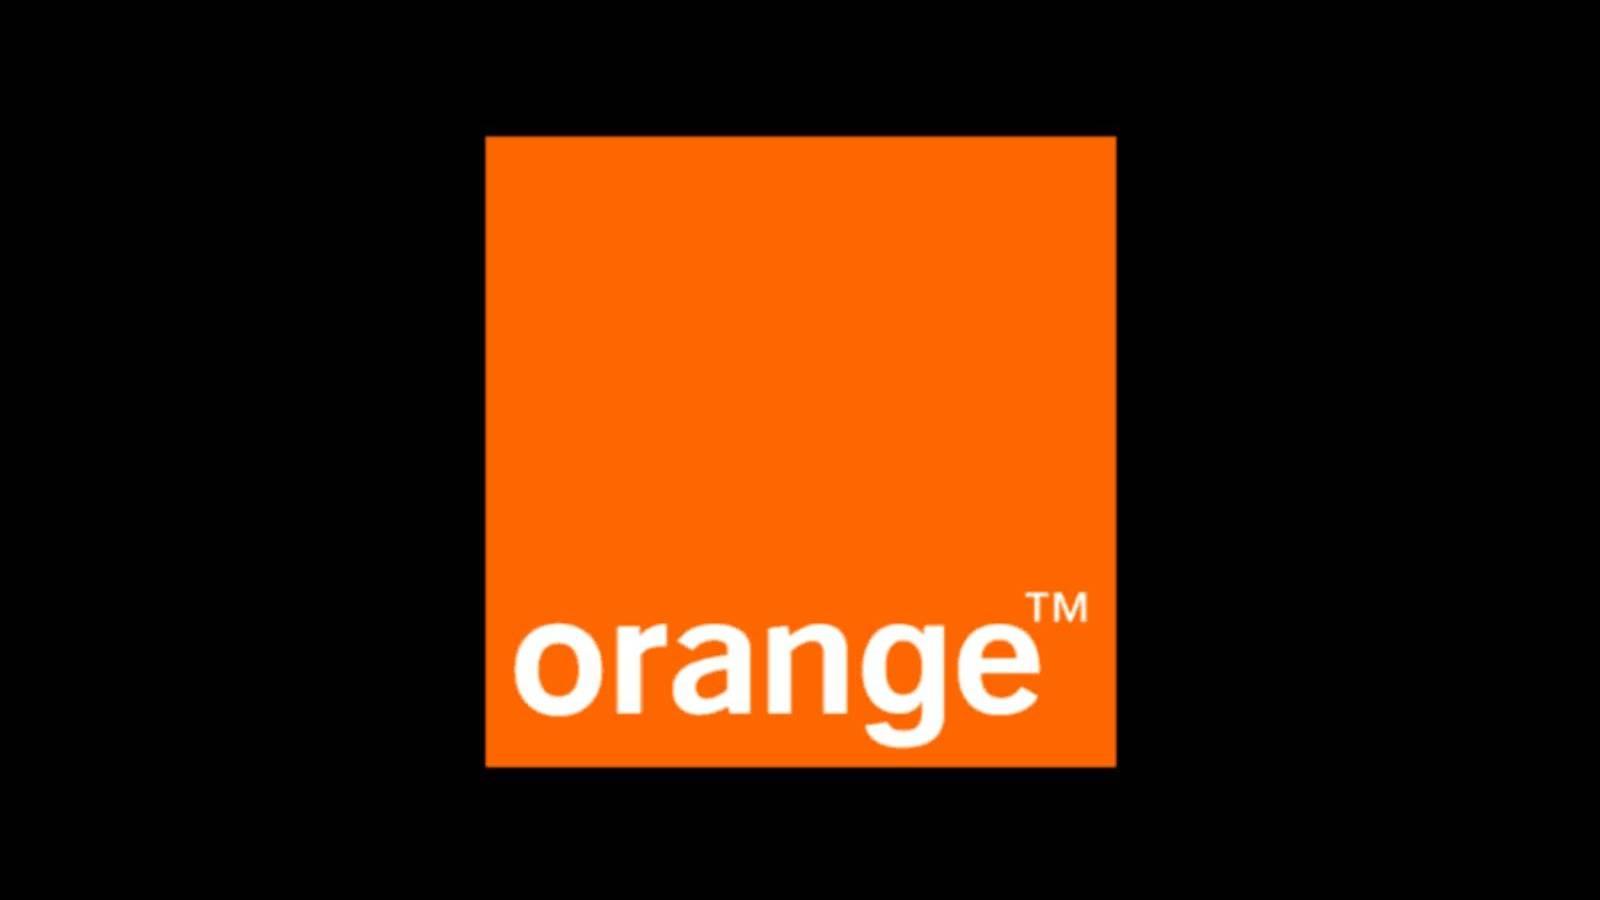 Orange alternative